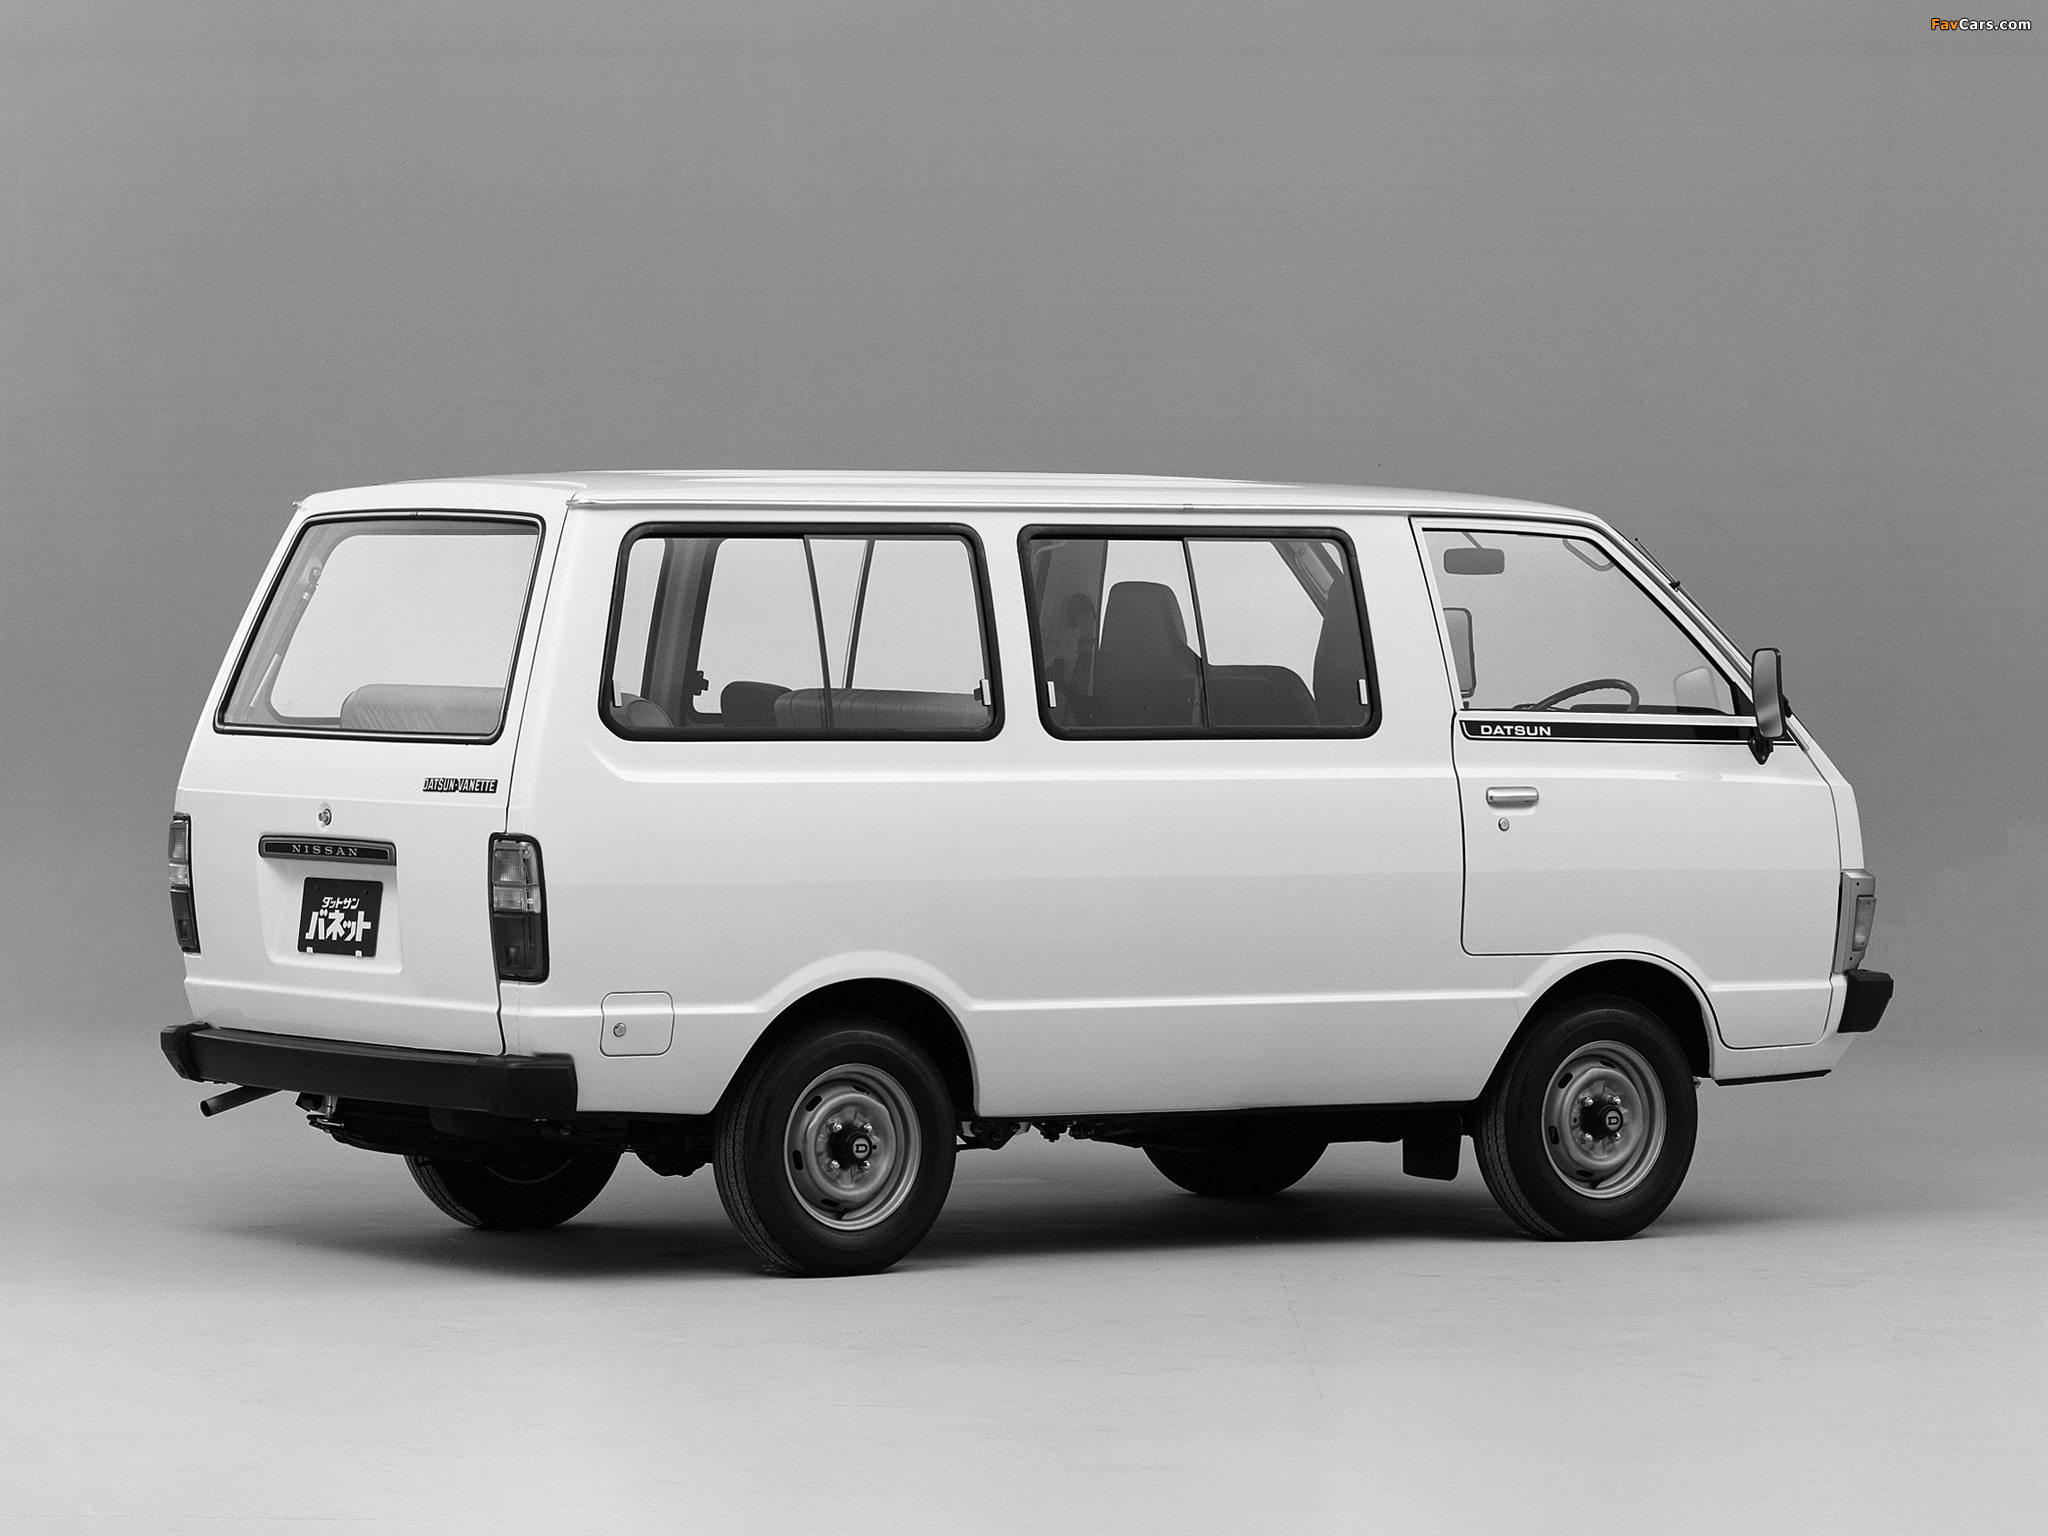 Wallpapers Of Nissan Datsun Vanette Coach C120 1980 85